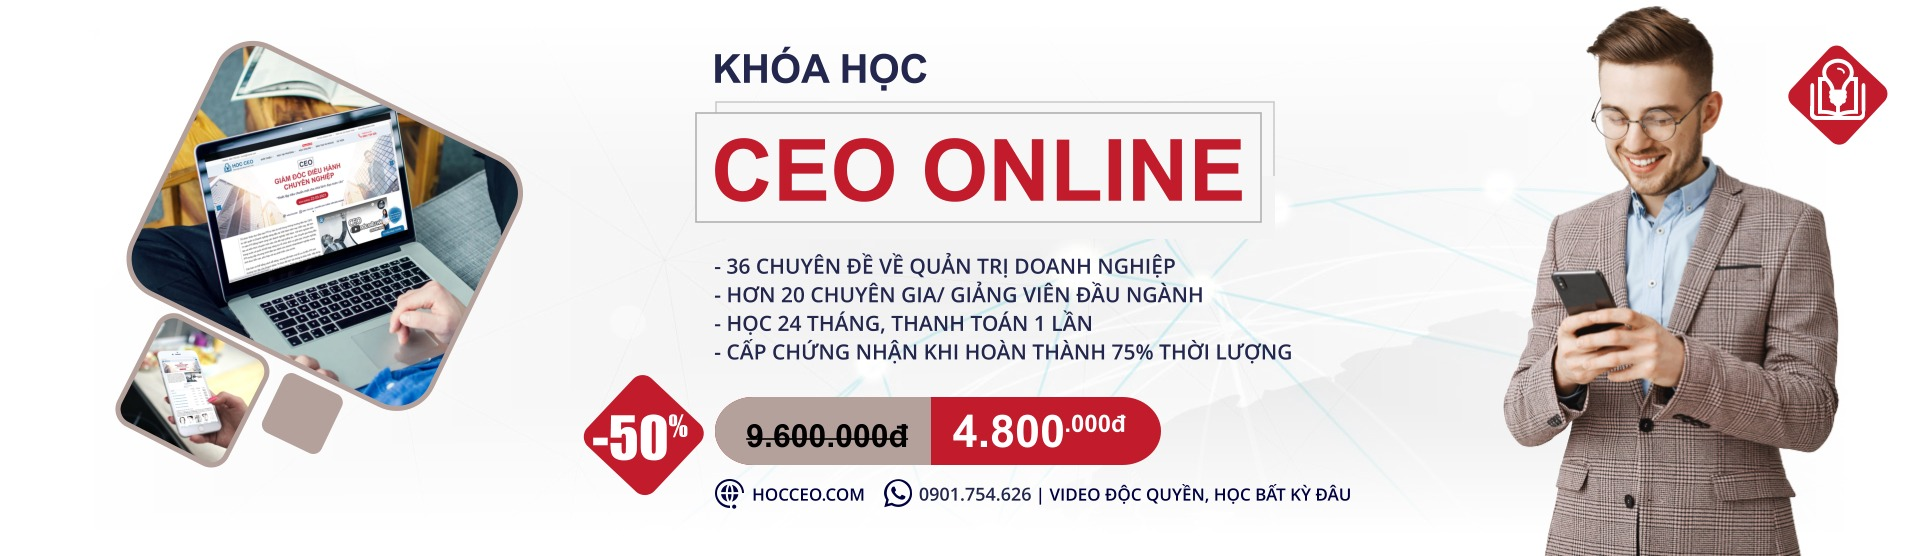 Khóa học CEO online